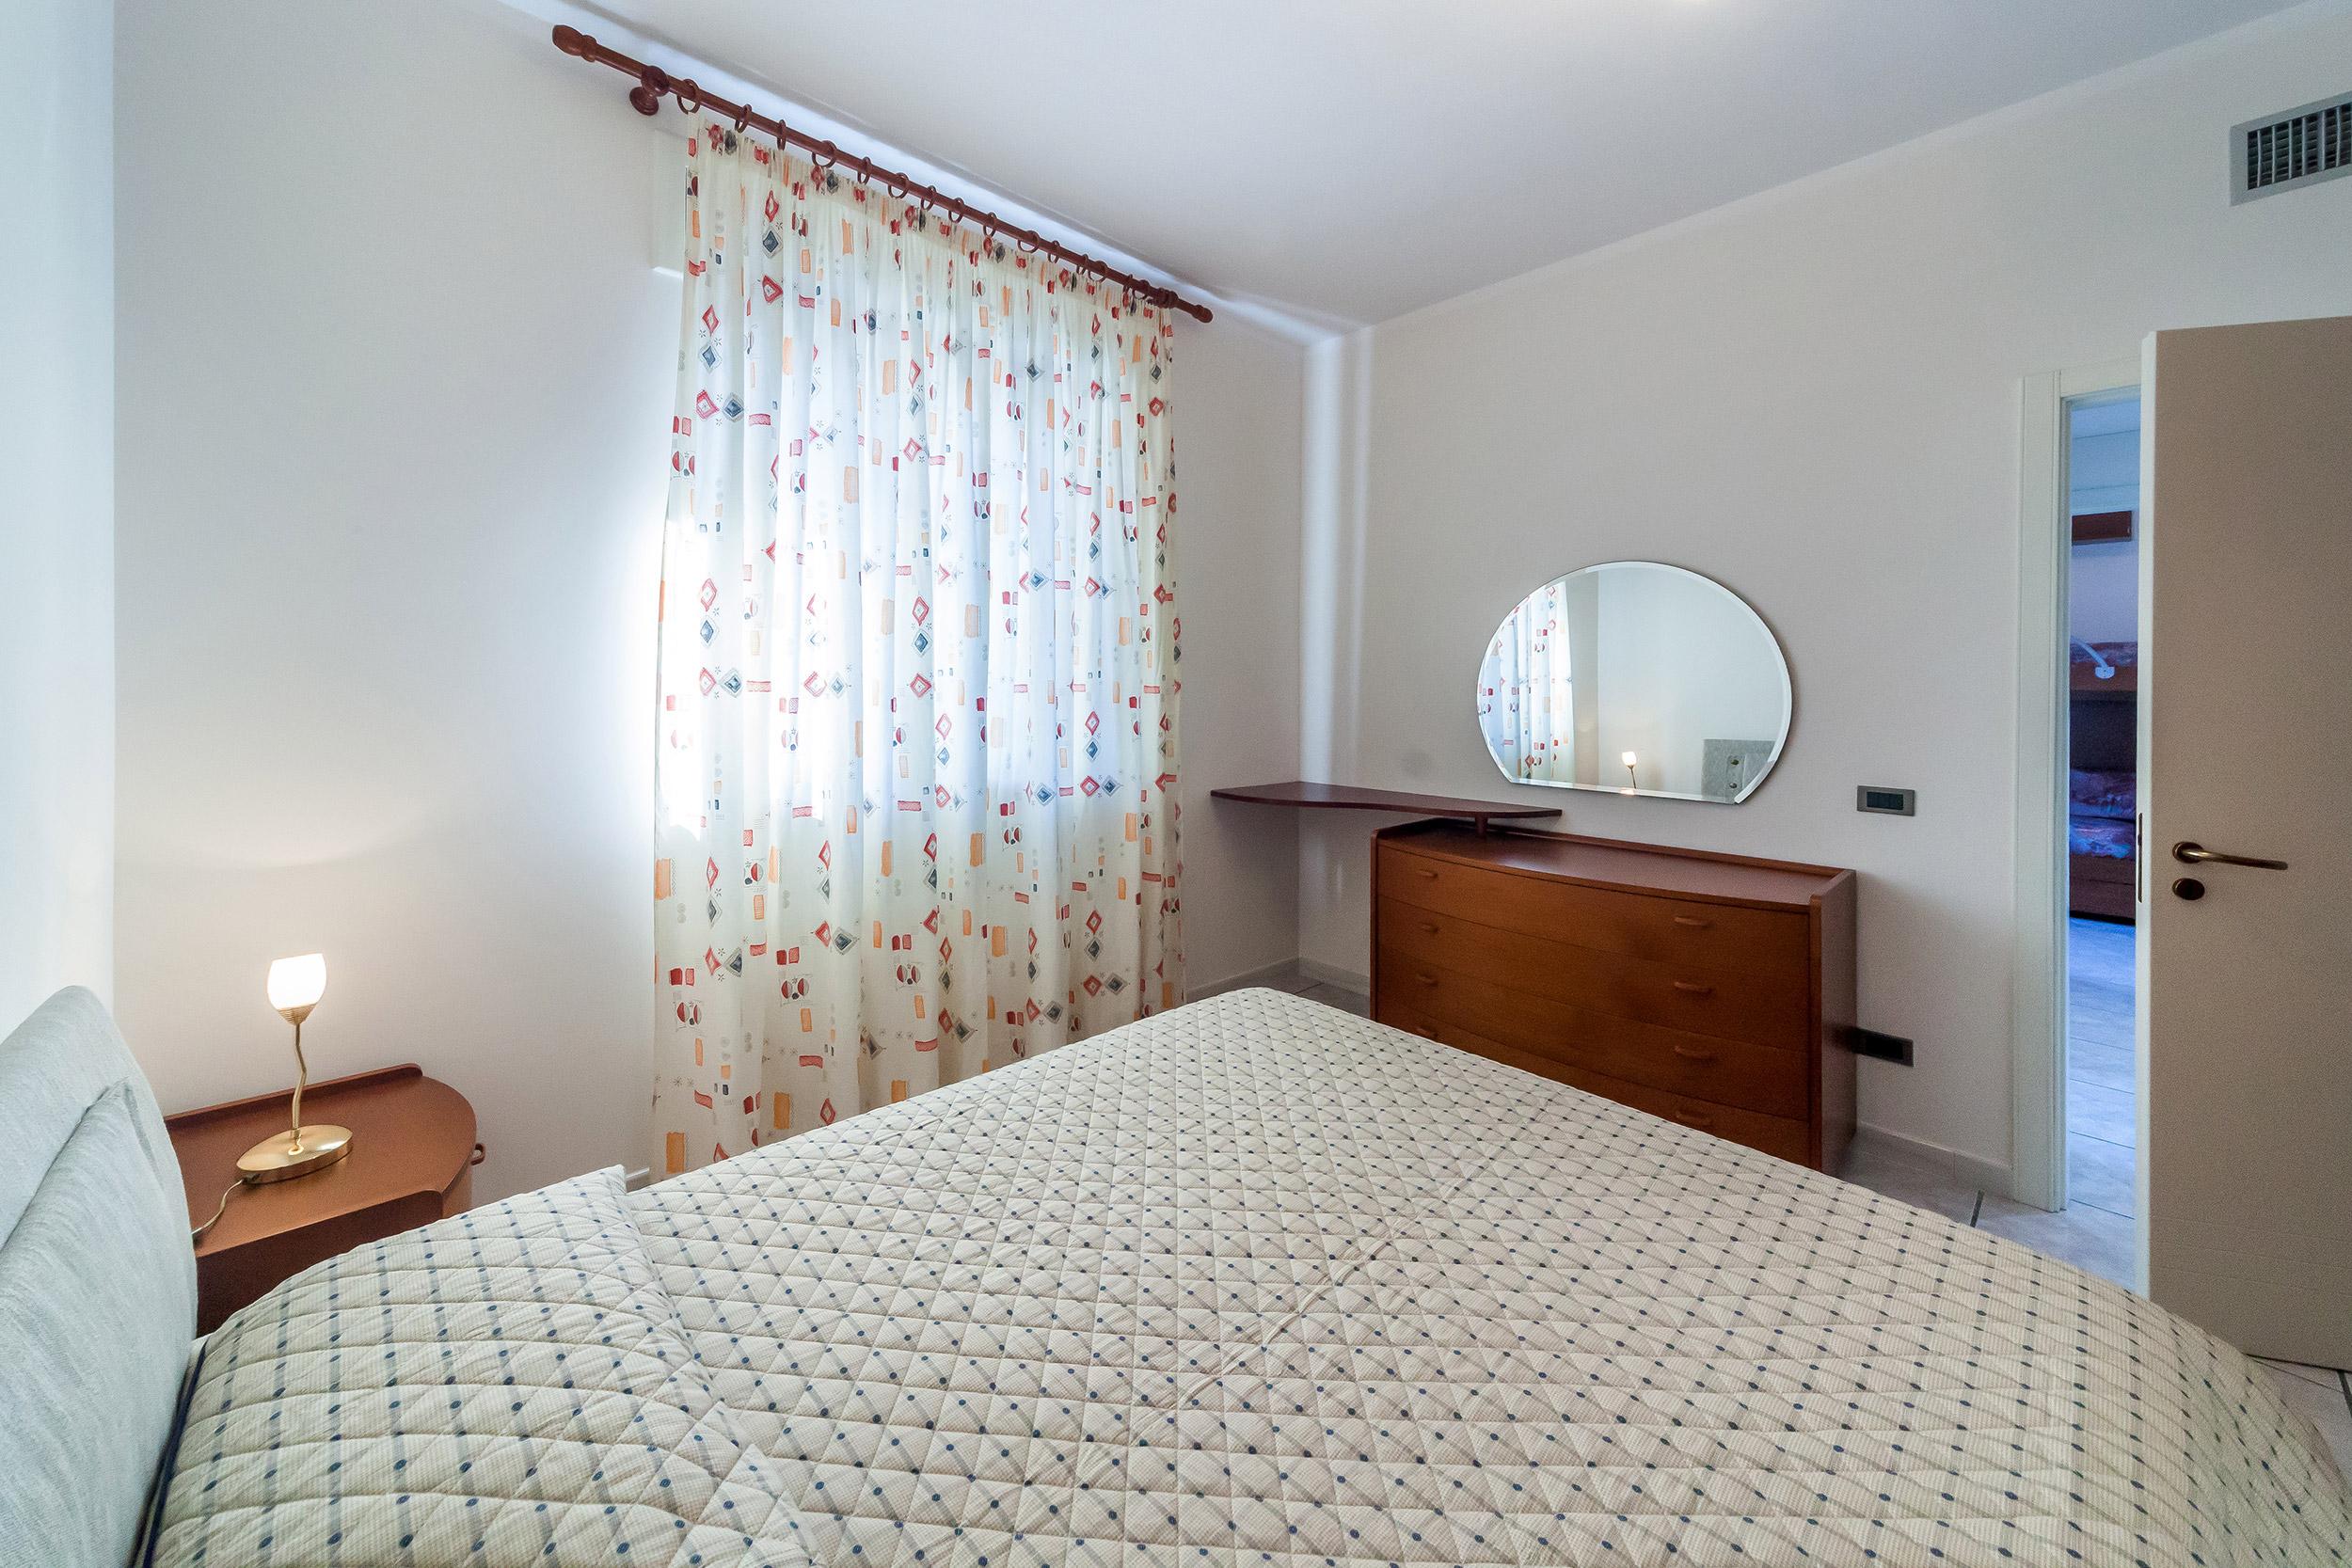 Ferienwohnung Appartamento vista mare a Gallipoli 4/6 posti - Baia Blu Side (2574458), Gallipoli, Lecce, Apulien, Italien, Bild 12